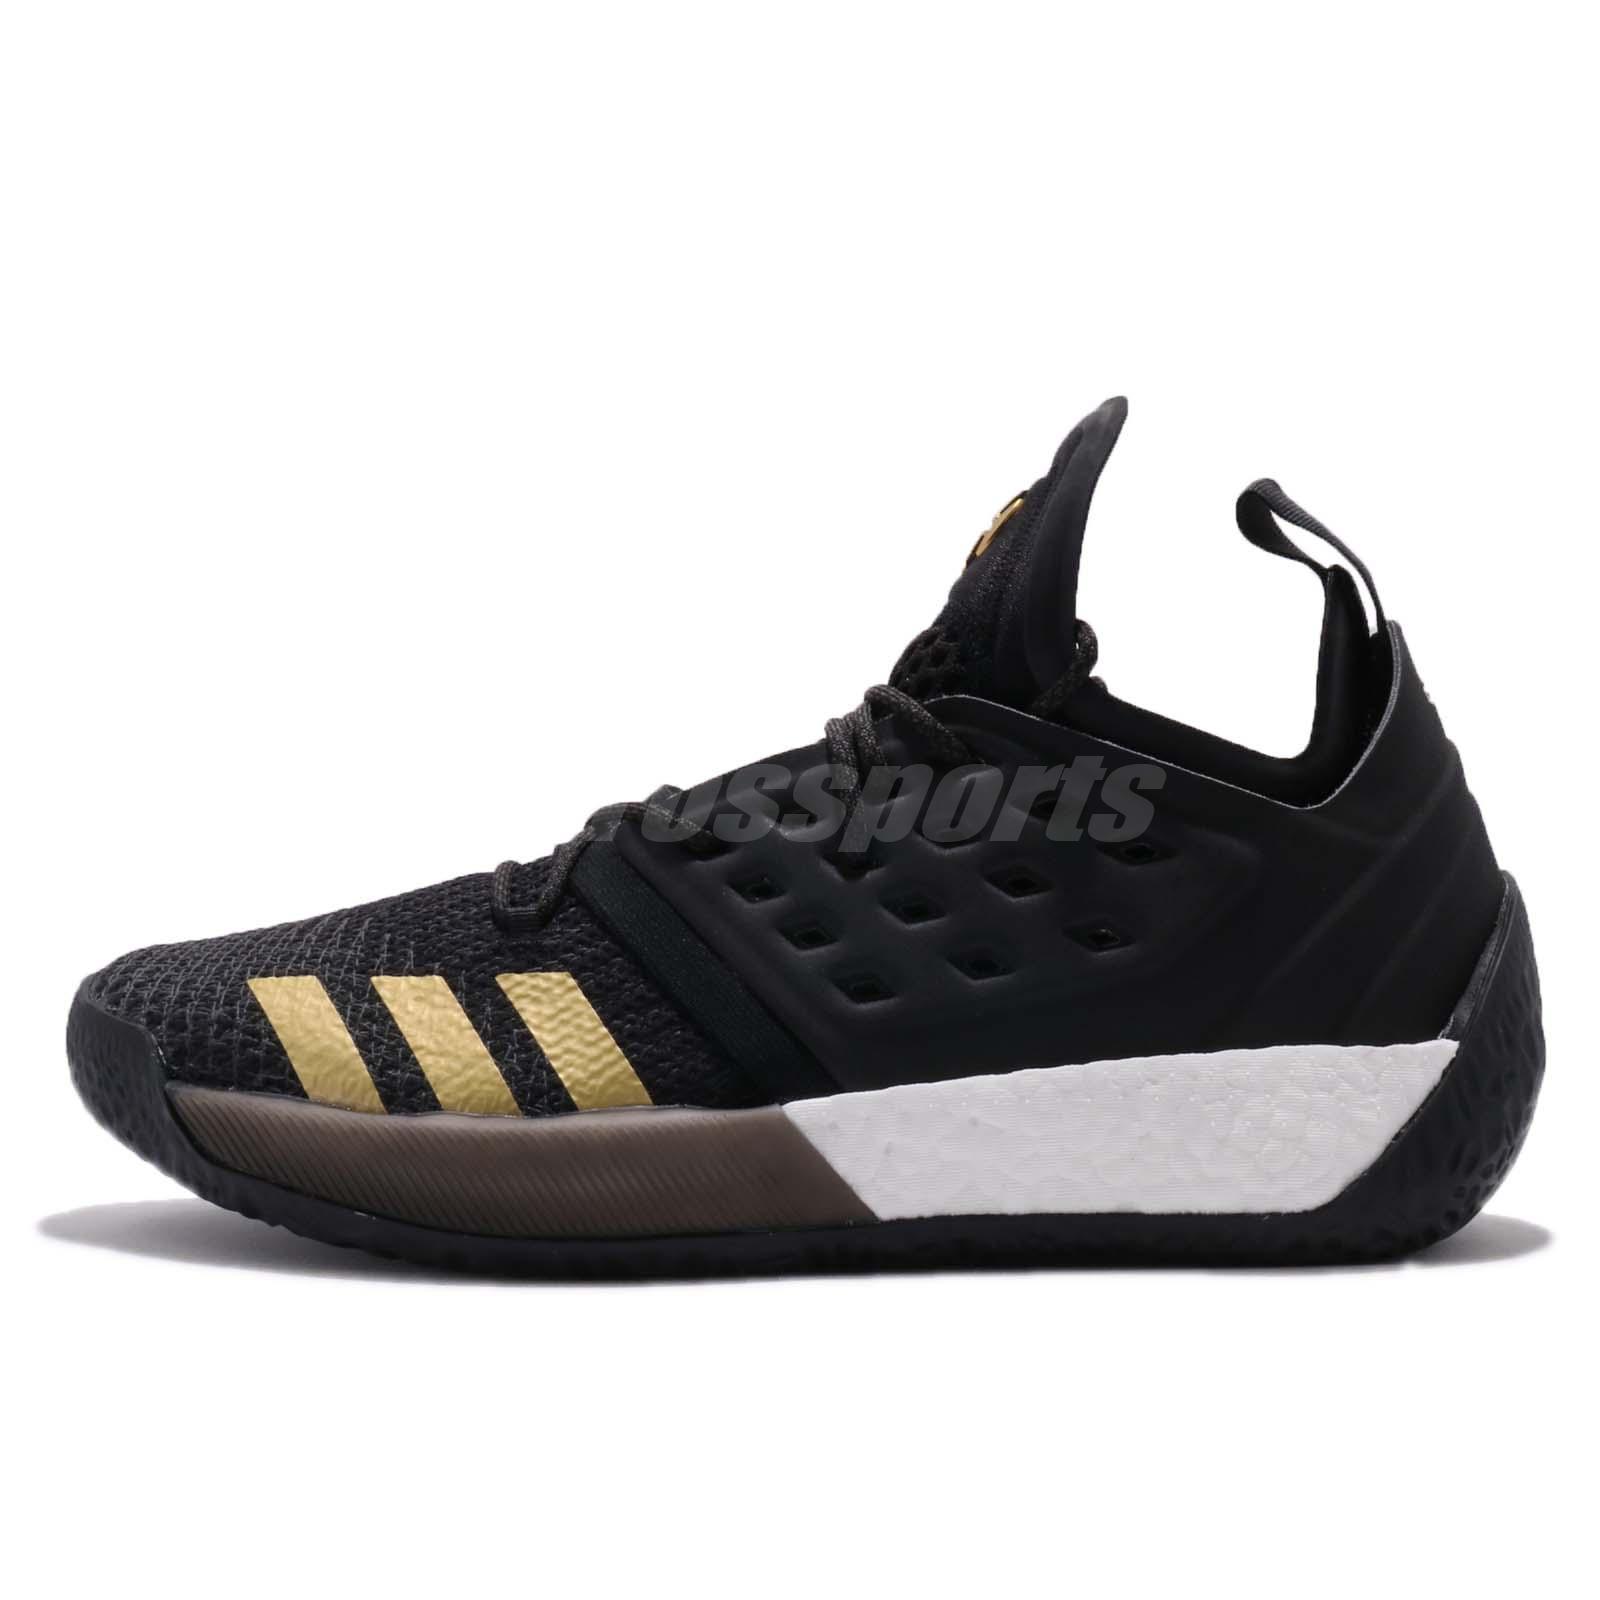 ce5028e4bb08ab adidas Harden Vol. 2 James II Imma Be A Star Black Gold Men Basketball  AH2215